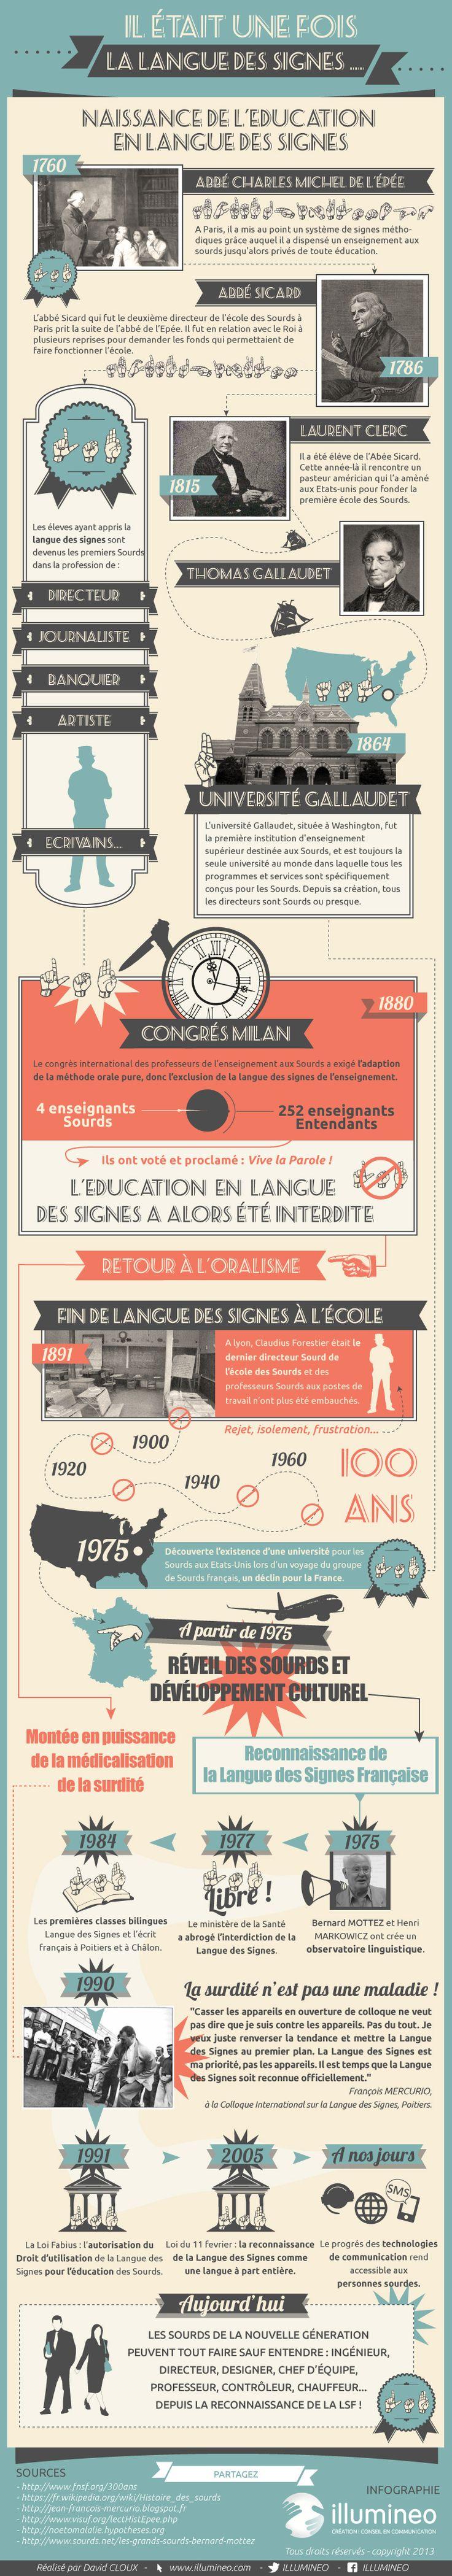 L'Histoire de la LSF